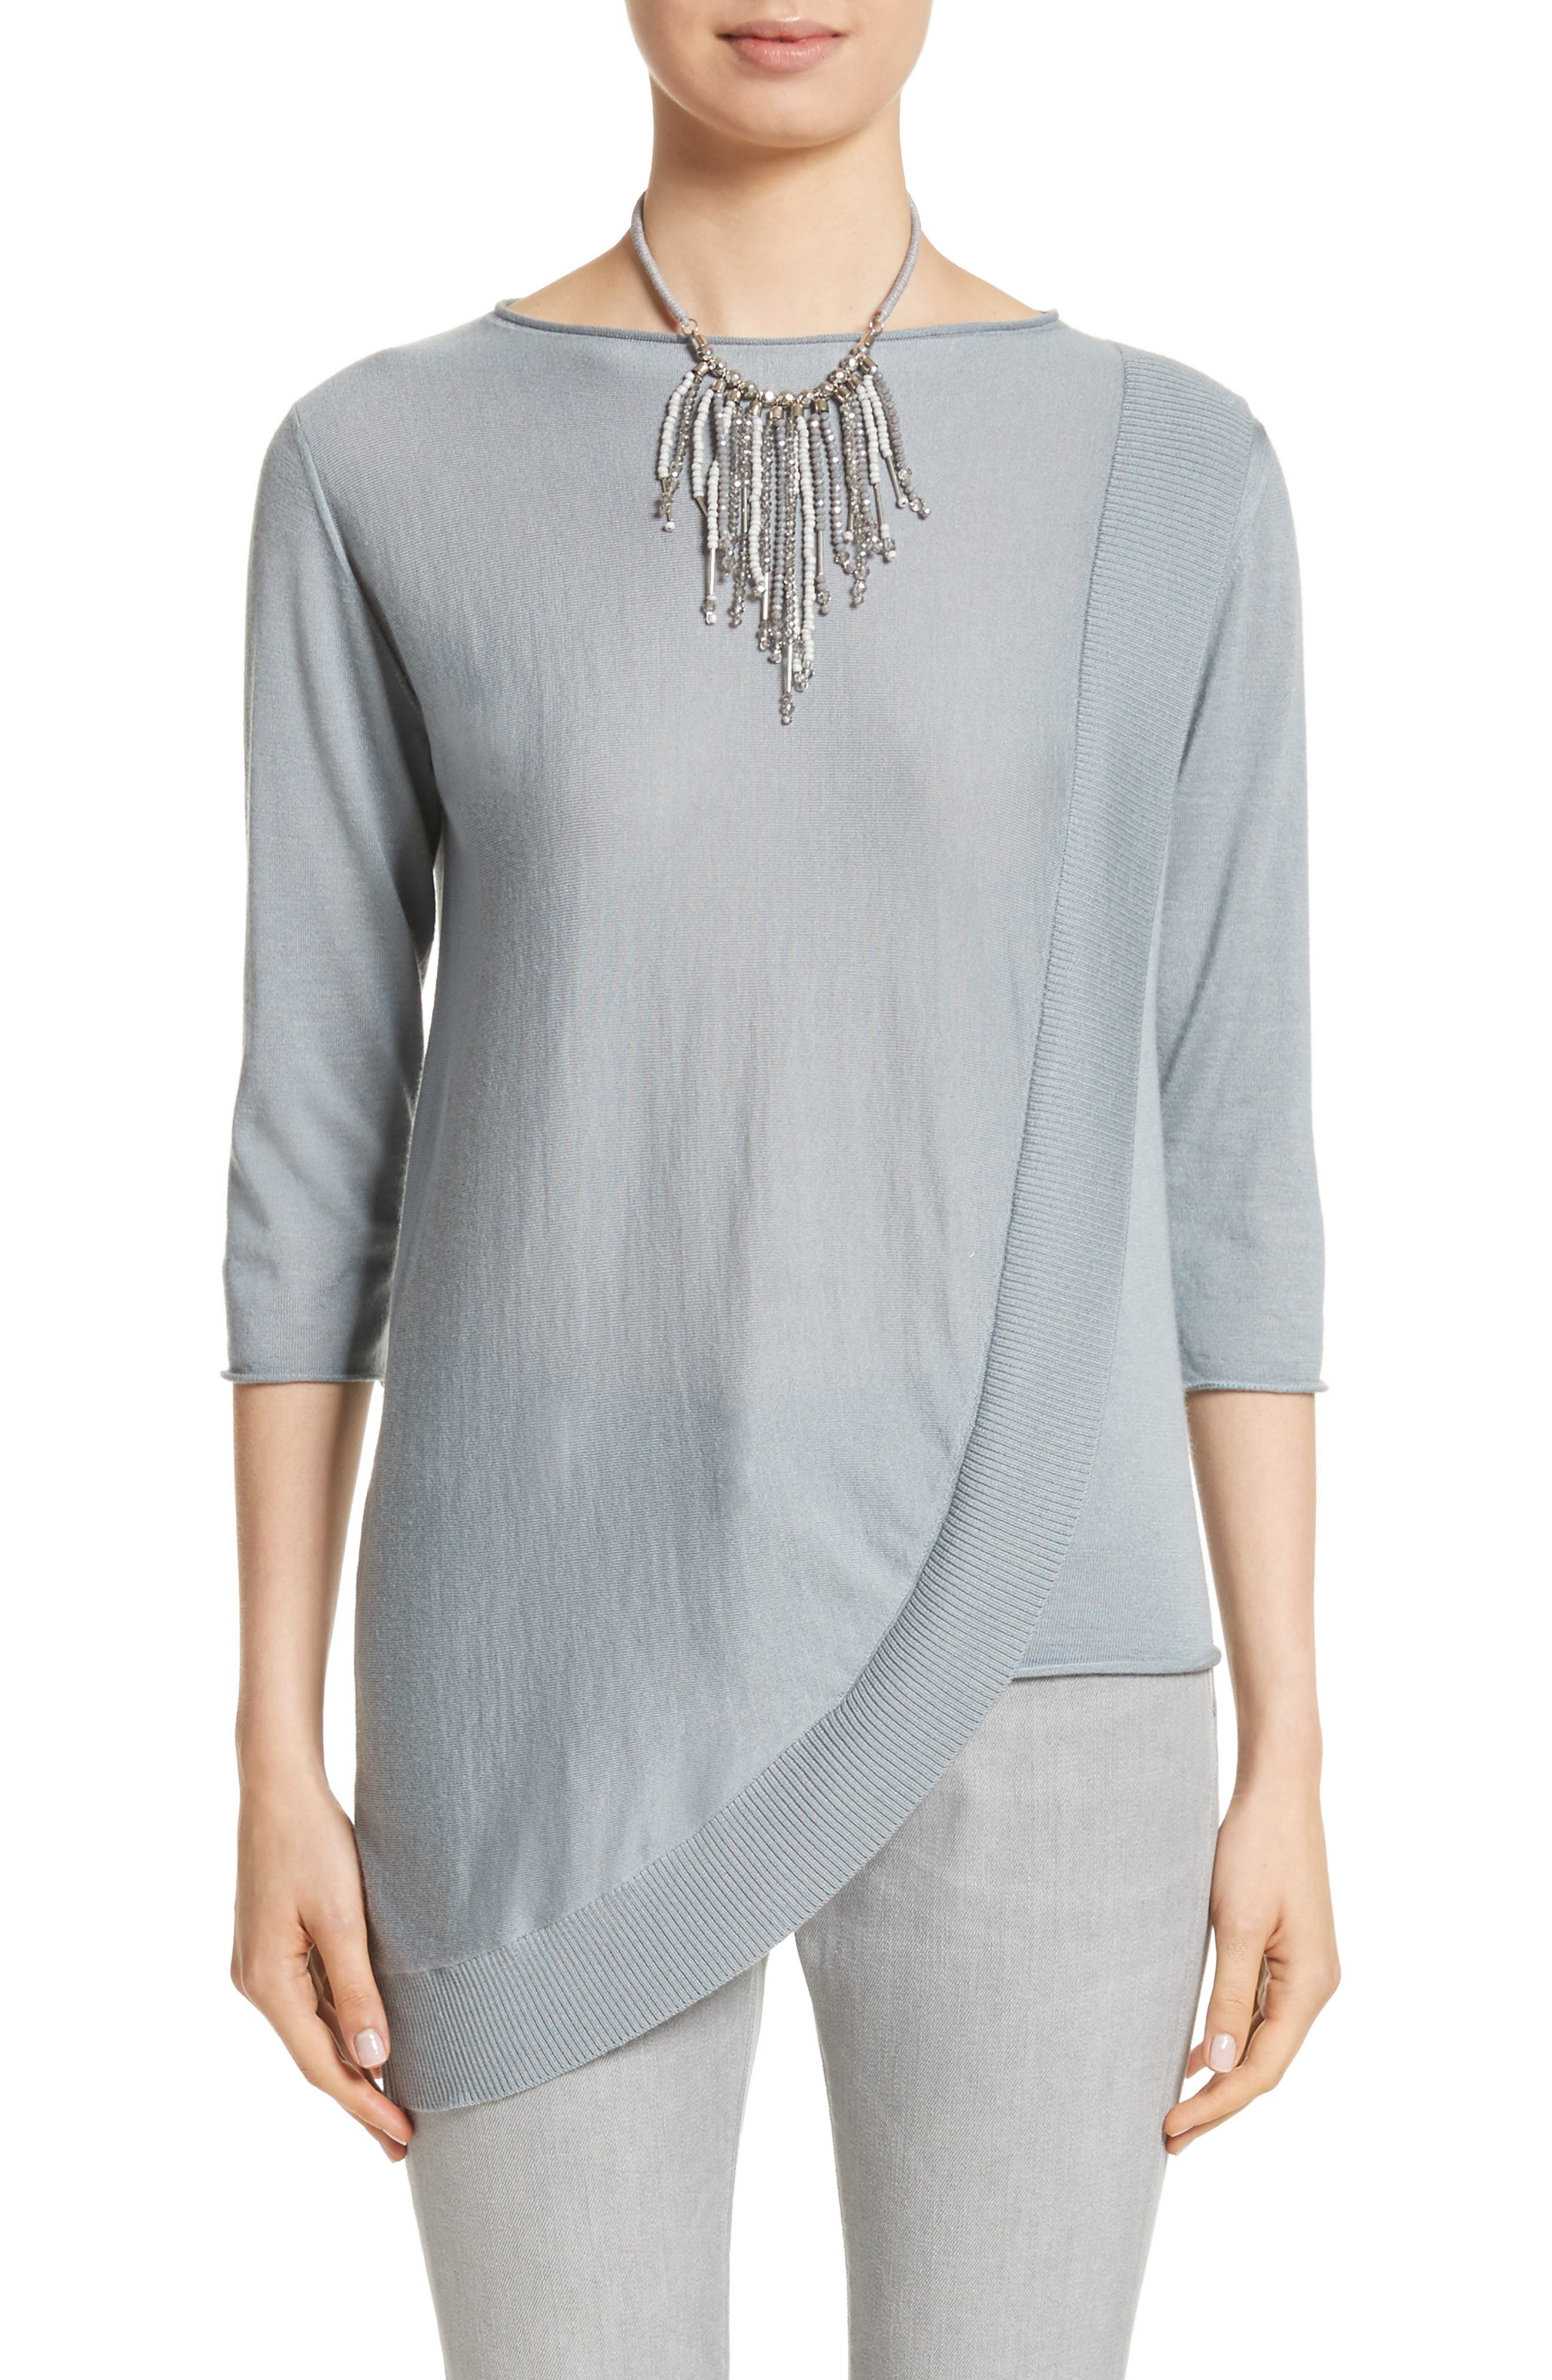 Fabiana Filippi Cashmere & Silk Drape Sweater